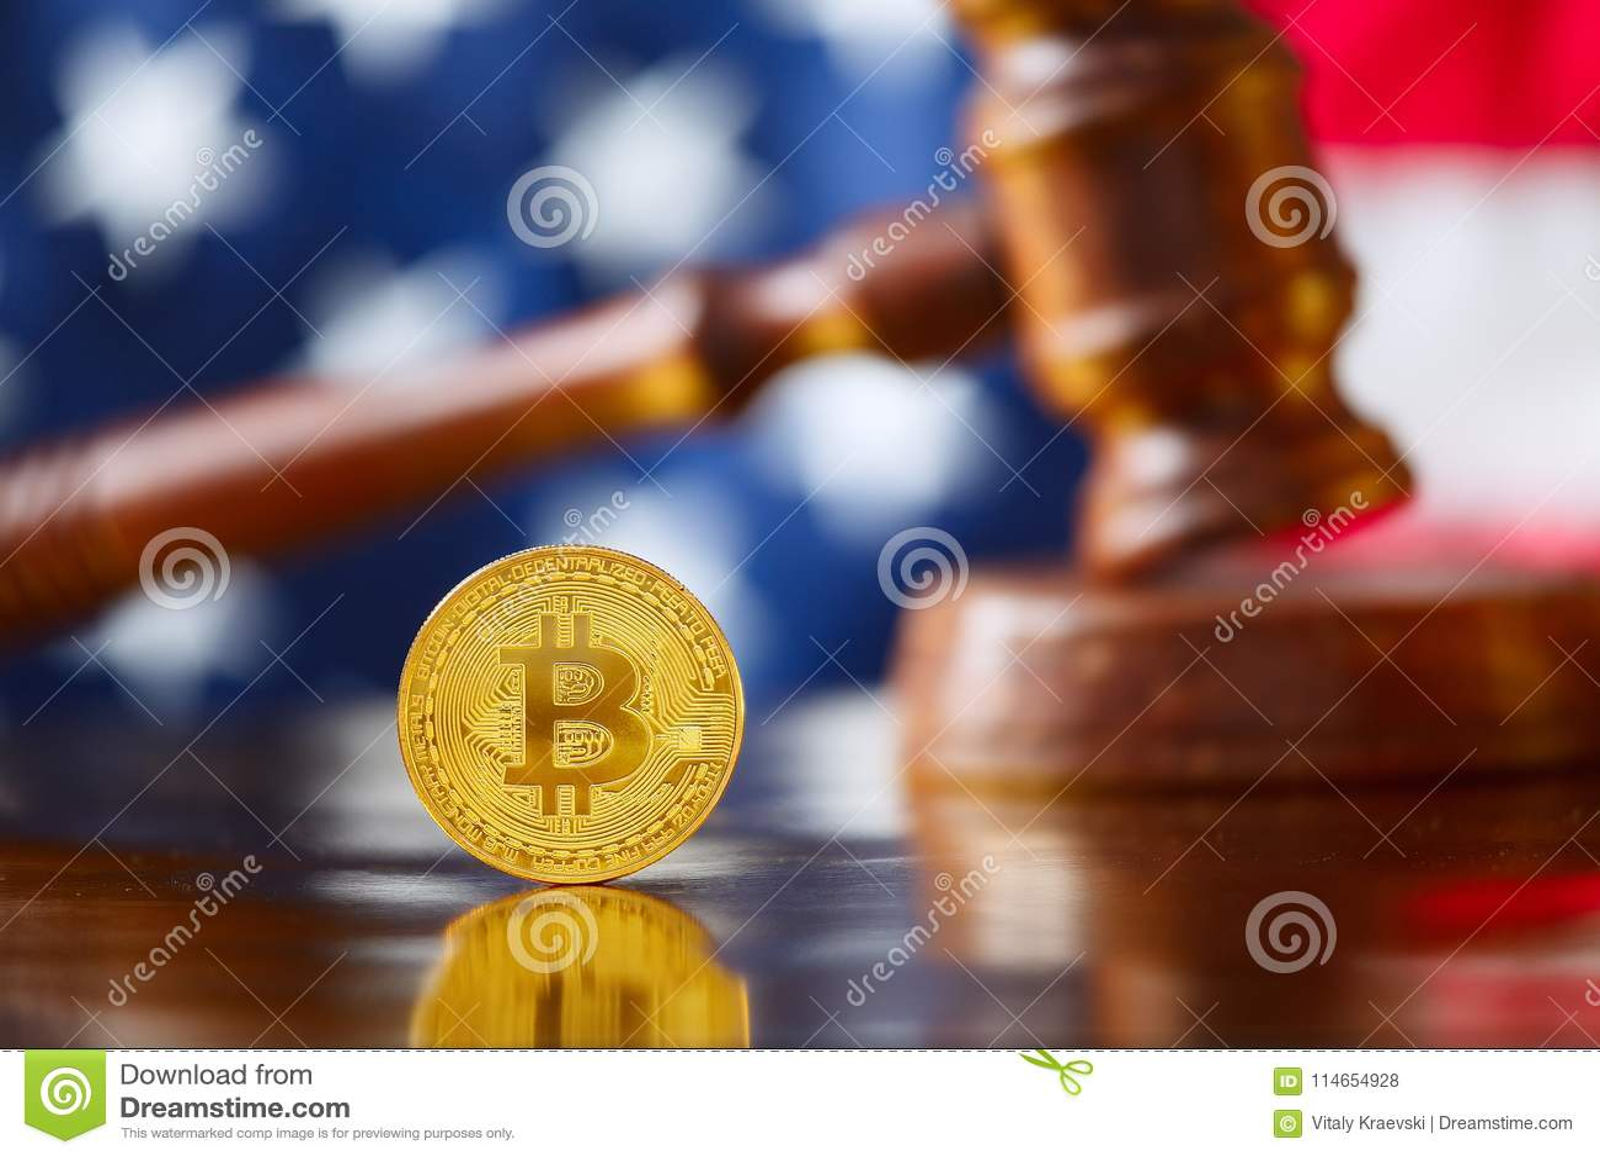 BItcoin infront of USA flag